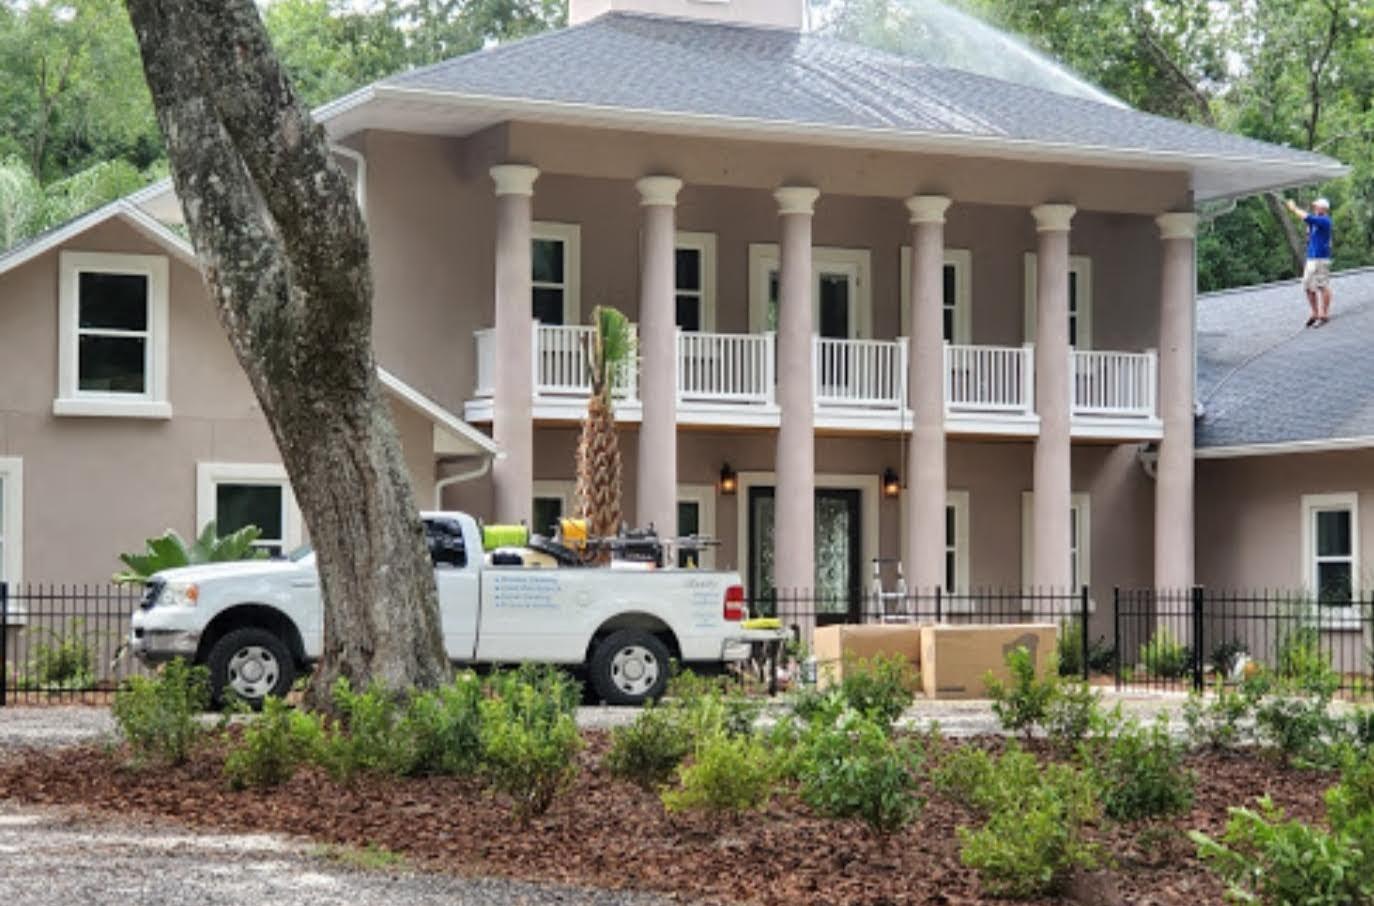 Softwashing a 3 story home in Fernandina Beach Florida